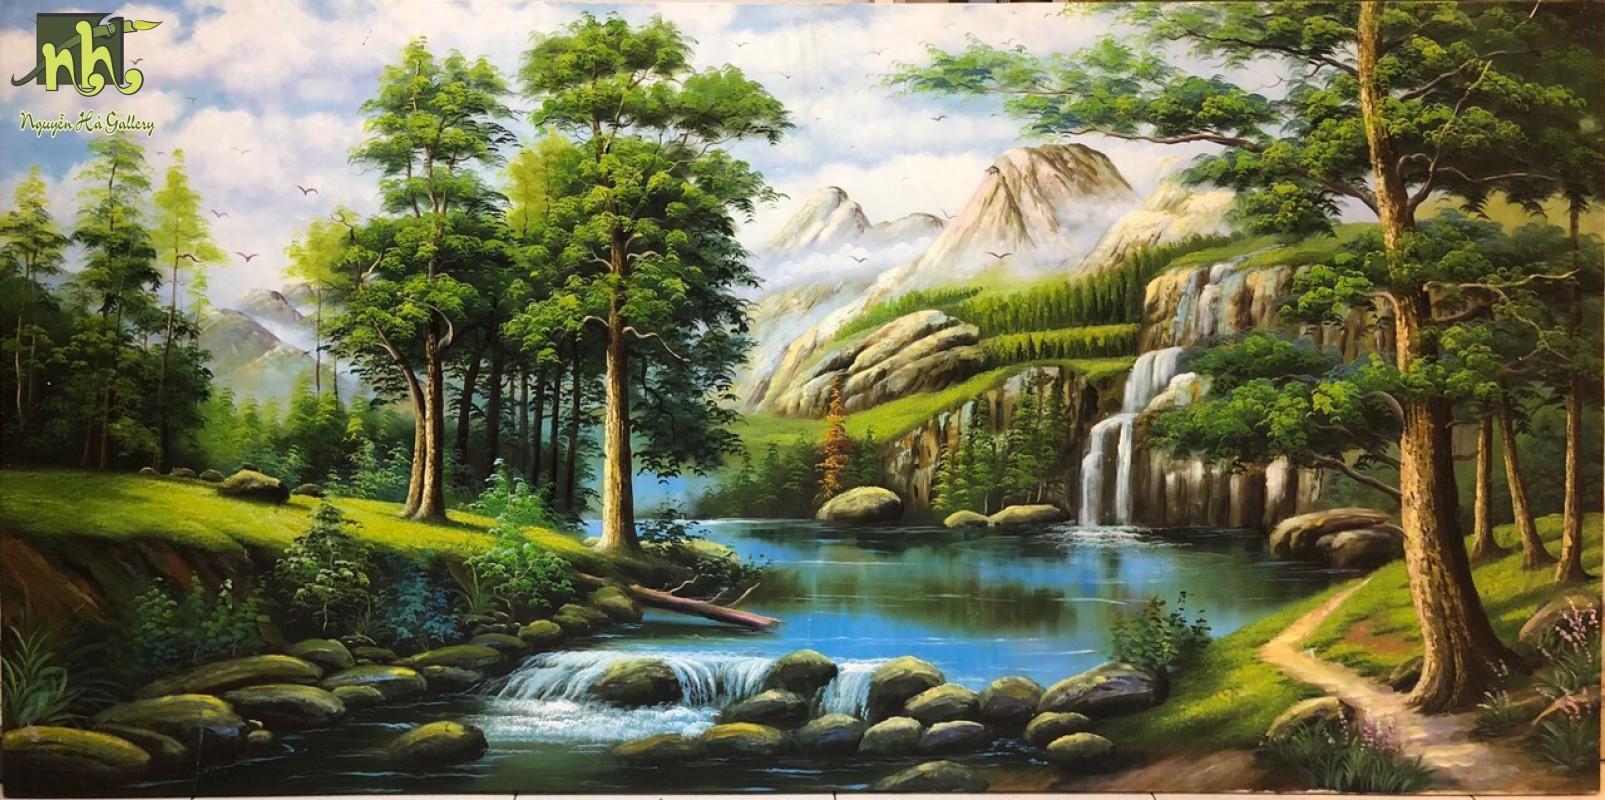 Tranh phong cảnh 2